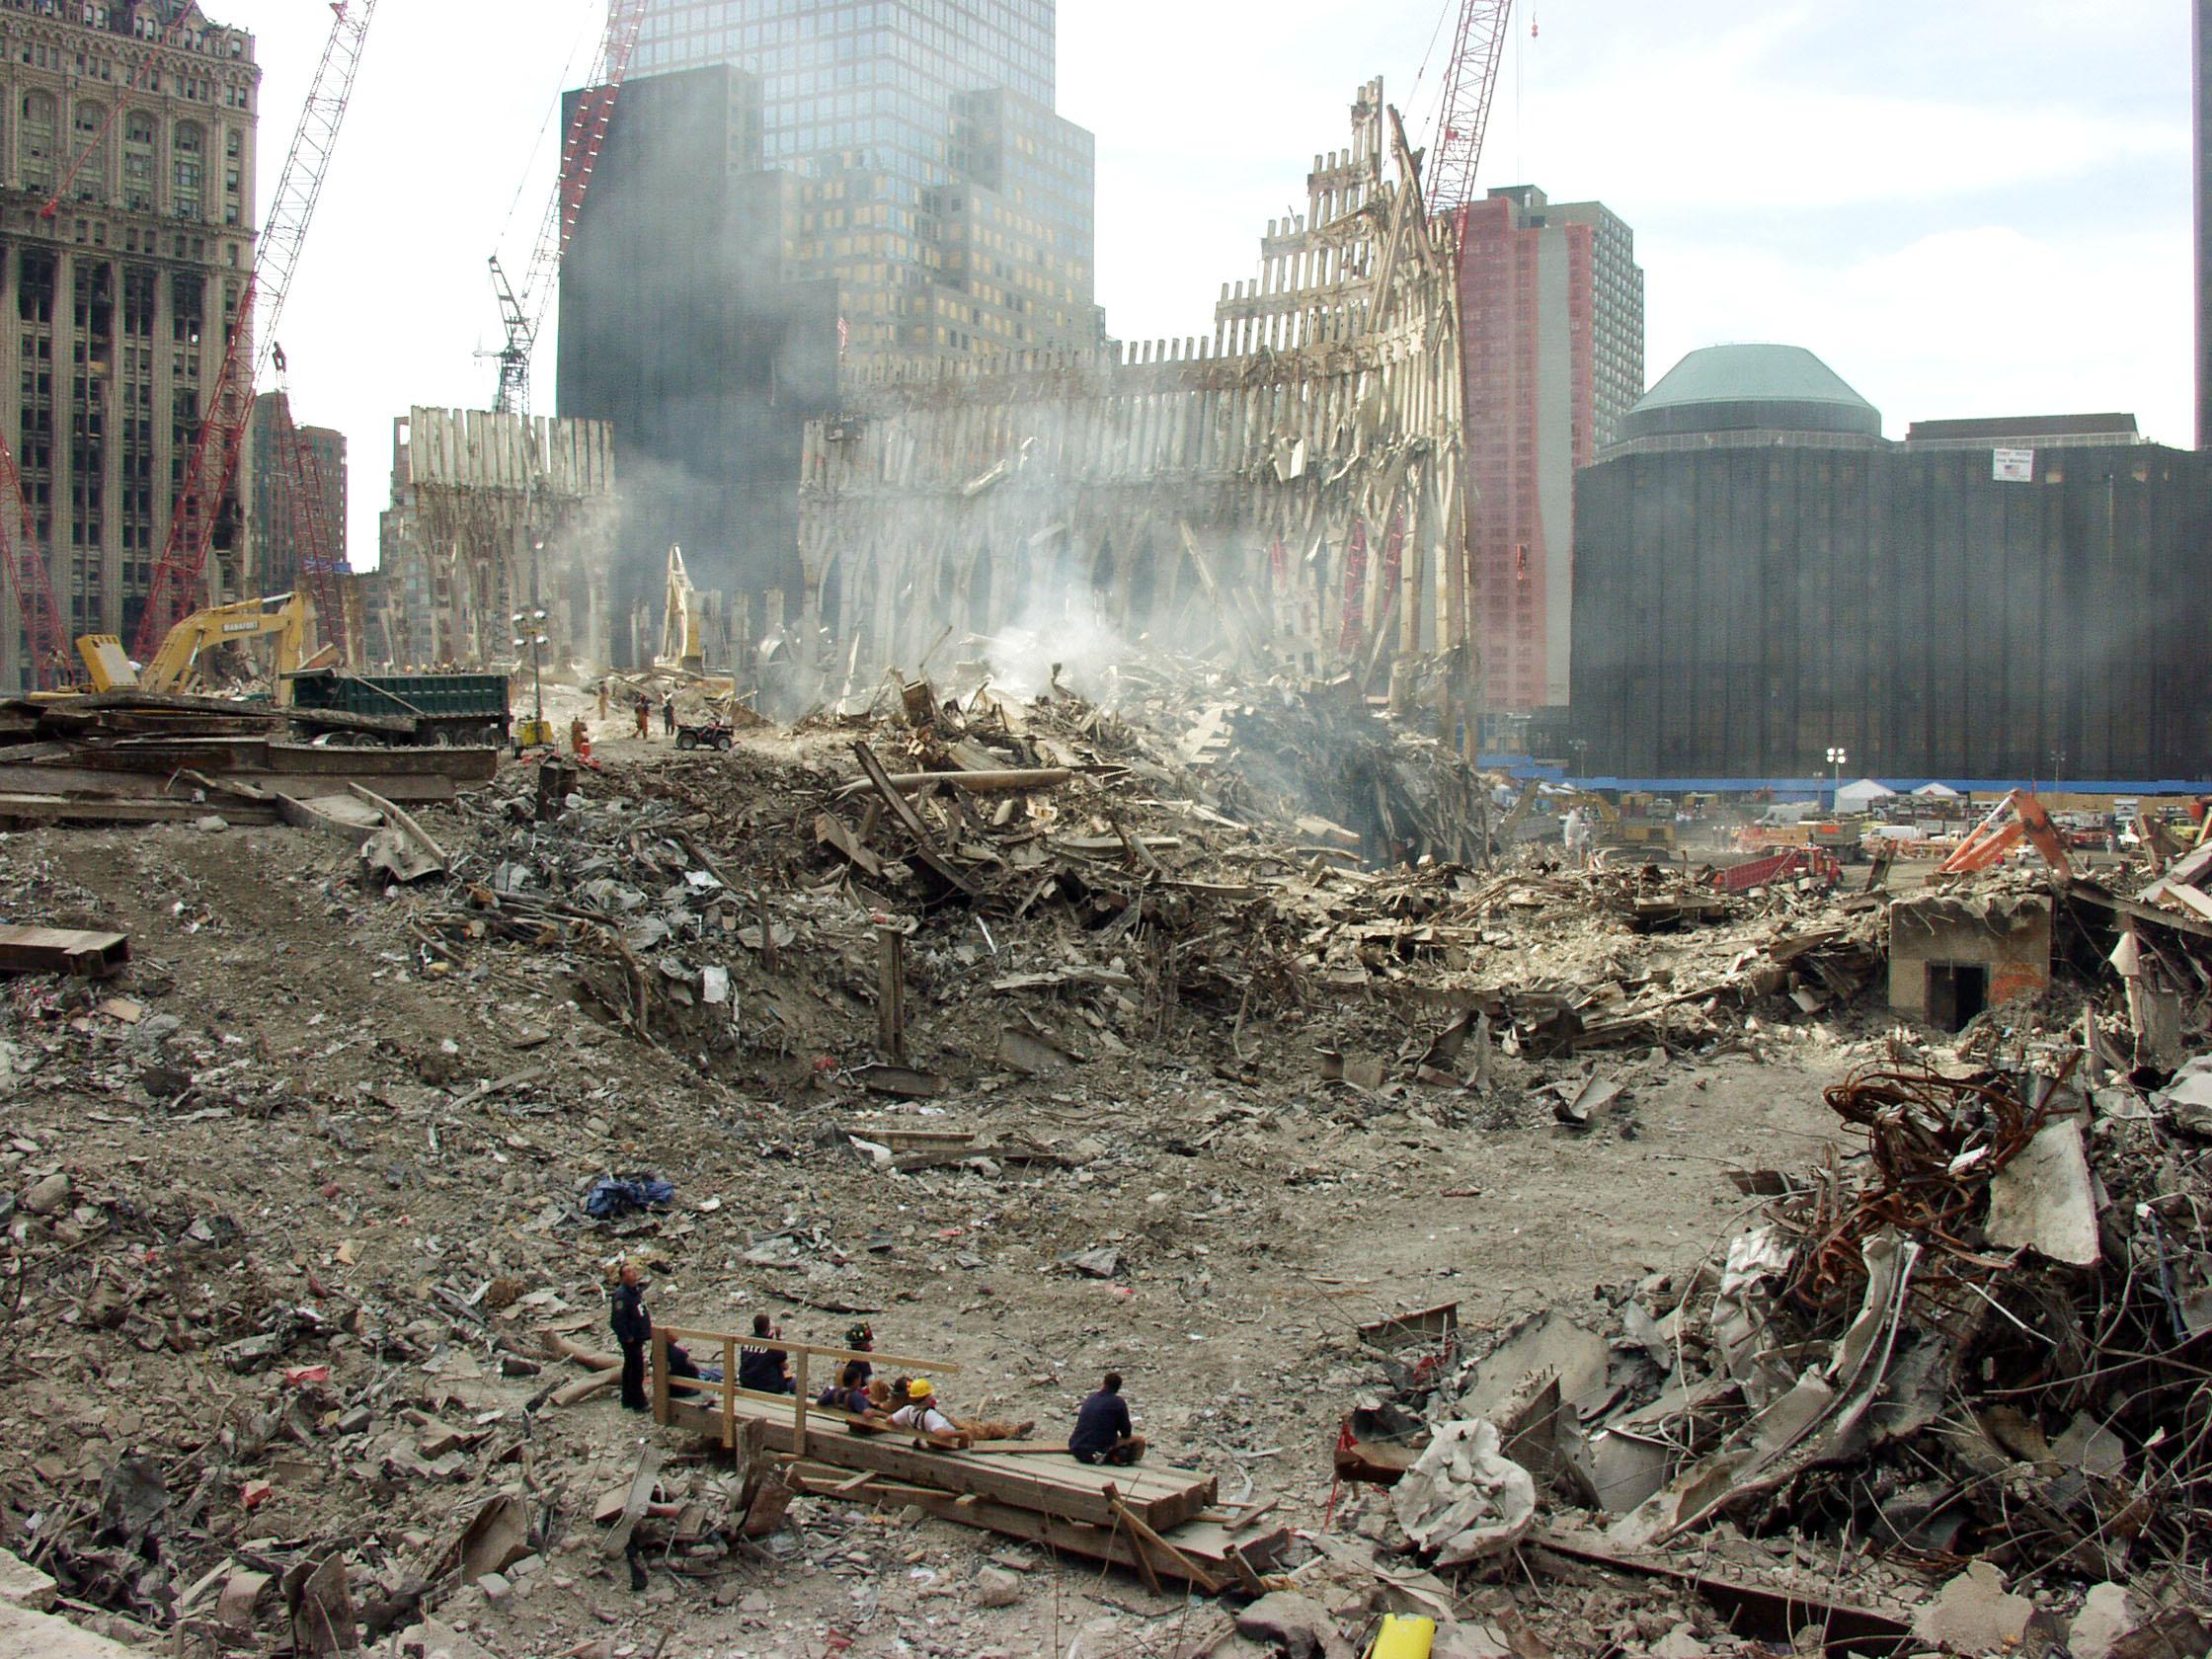 DR 1391 NY 10 12 2001 New York City Ground Zero Debrie Removal